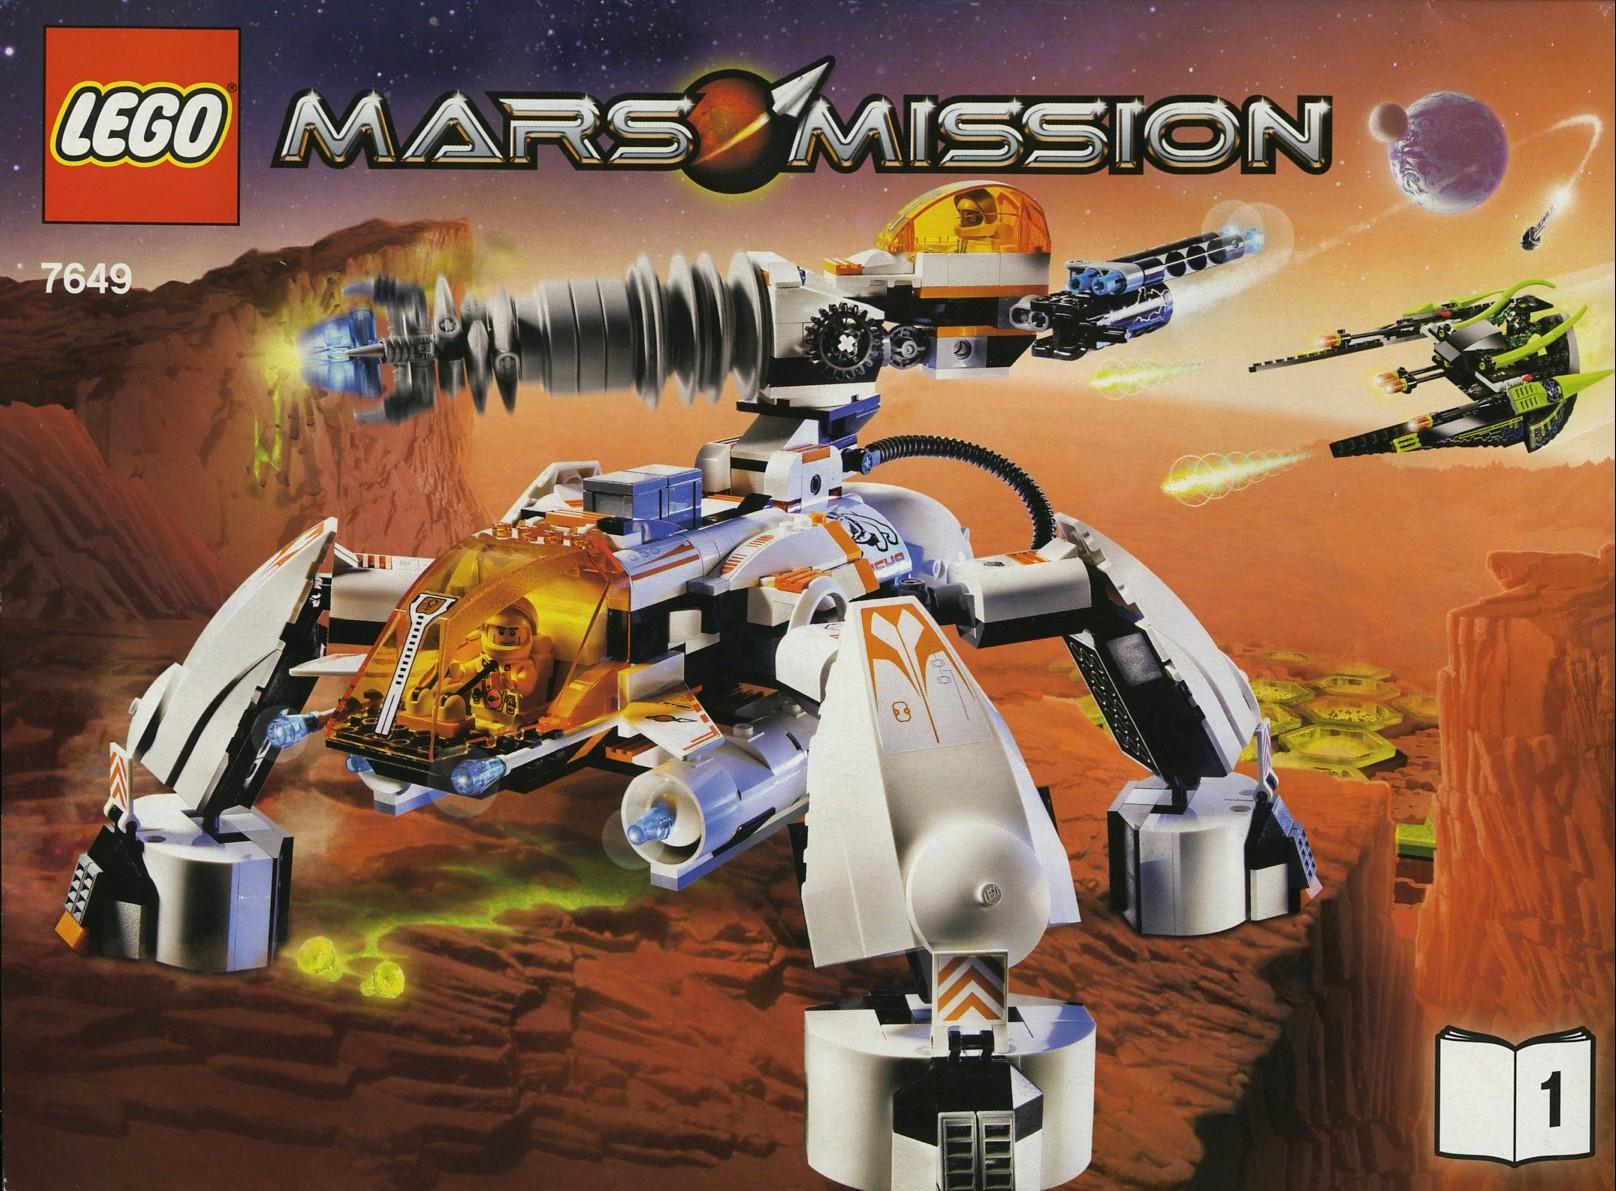 Lego games mars mission 2 harrahs casino nv